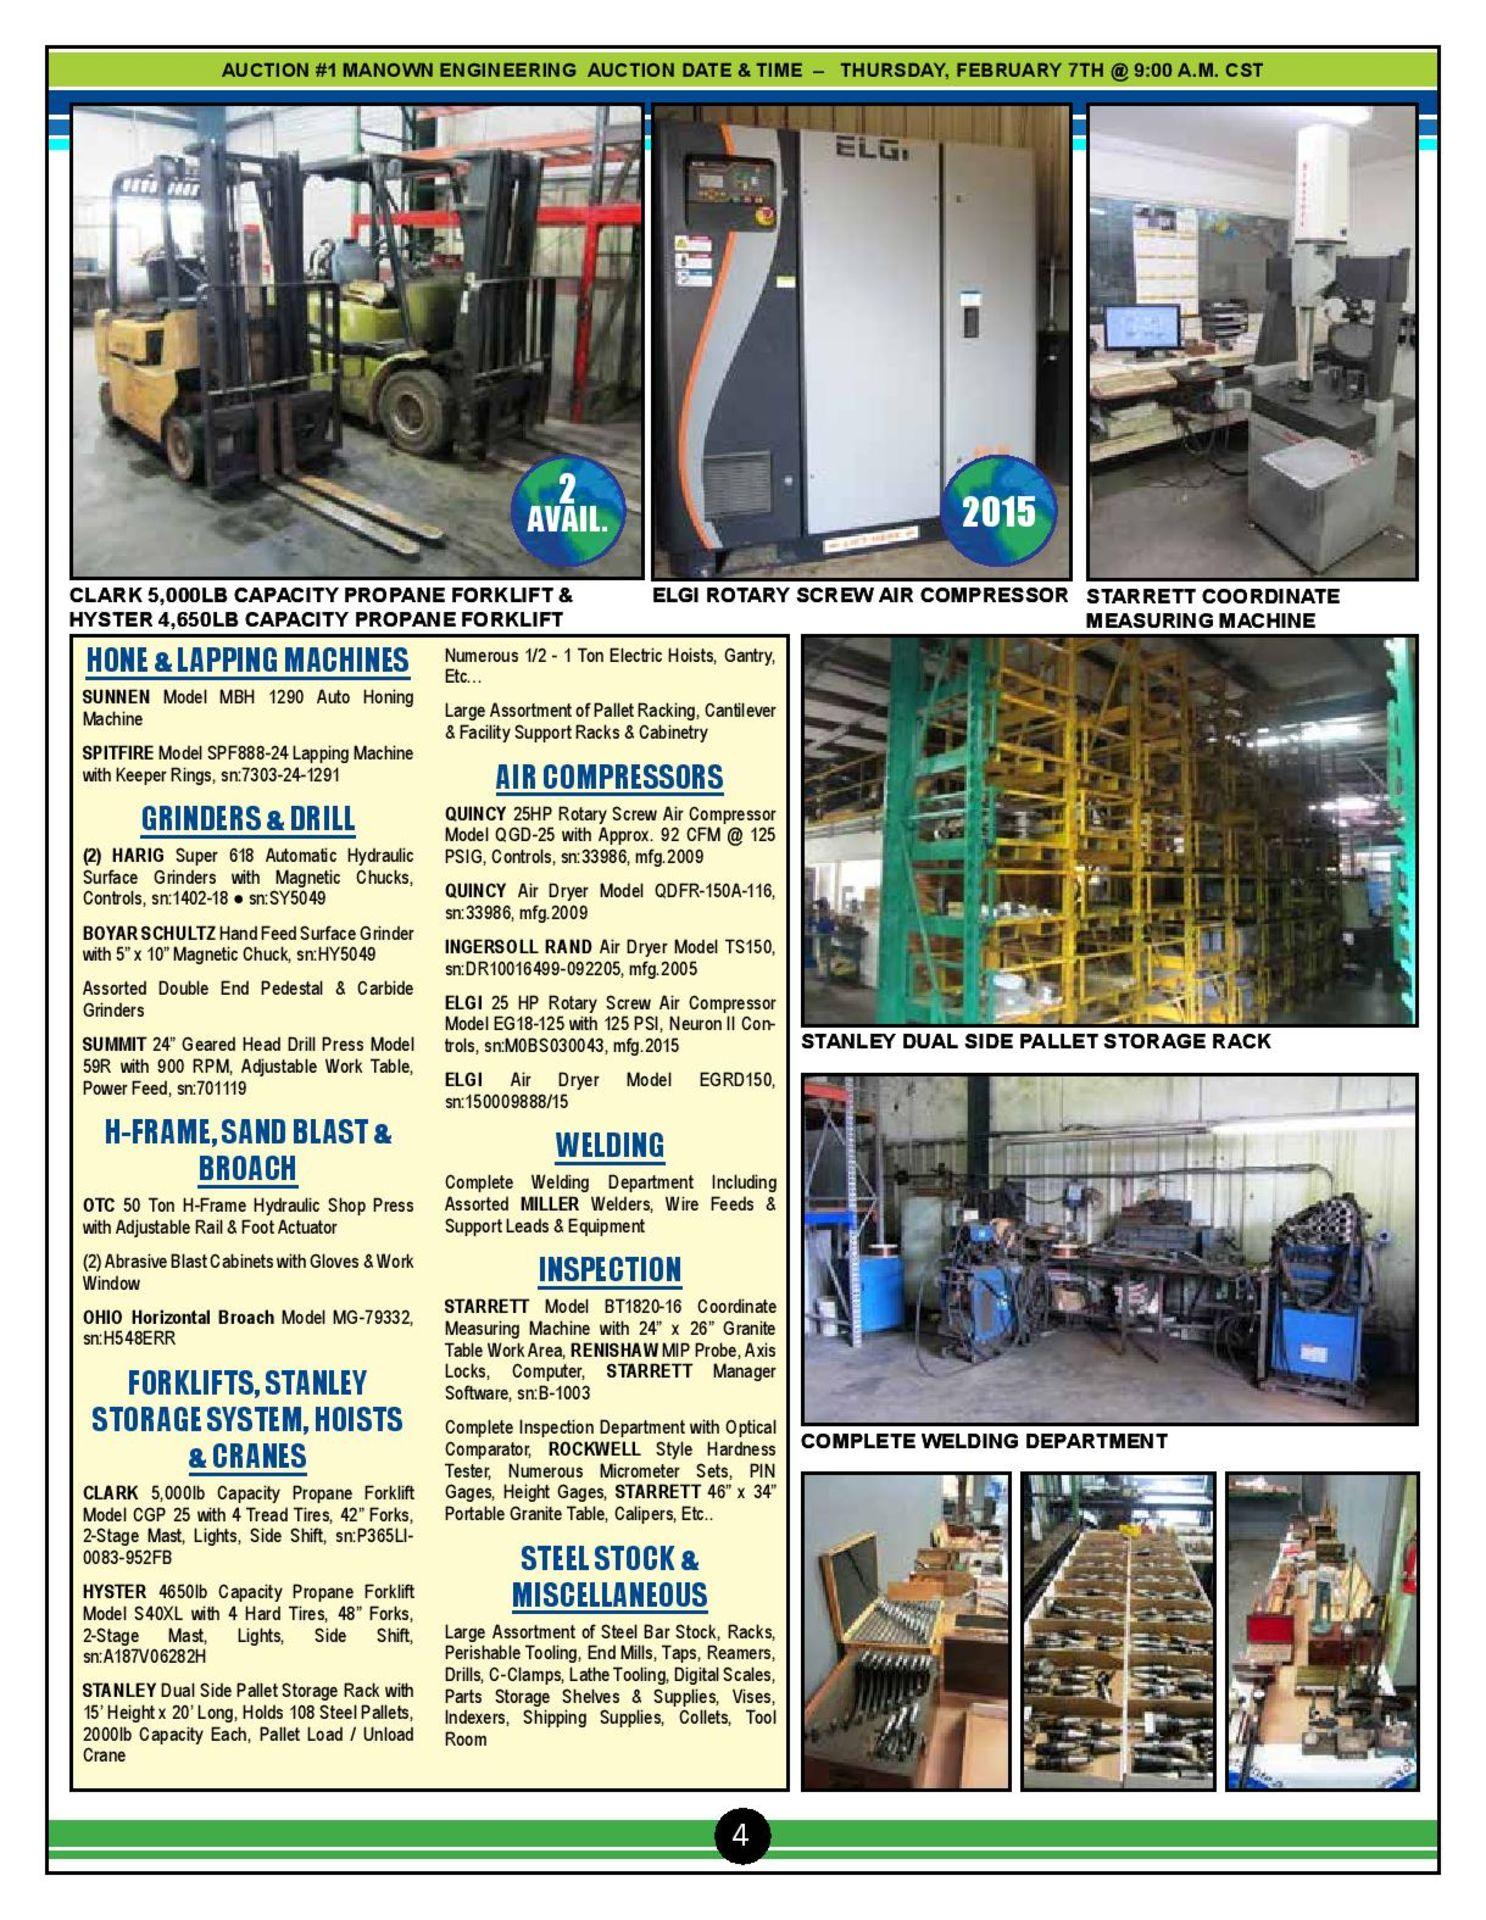 Lot 0 - Walk Thru Video for CNC & Machine Shop Equipment